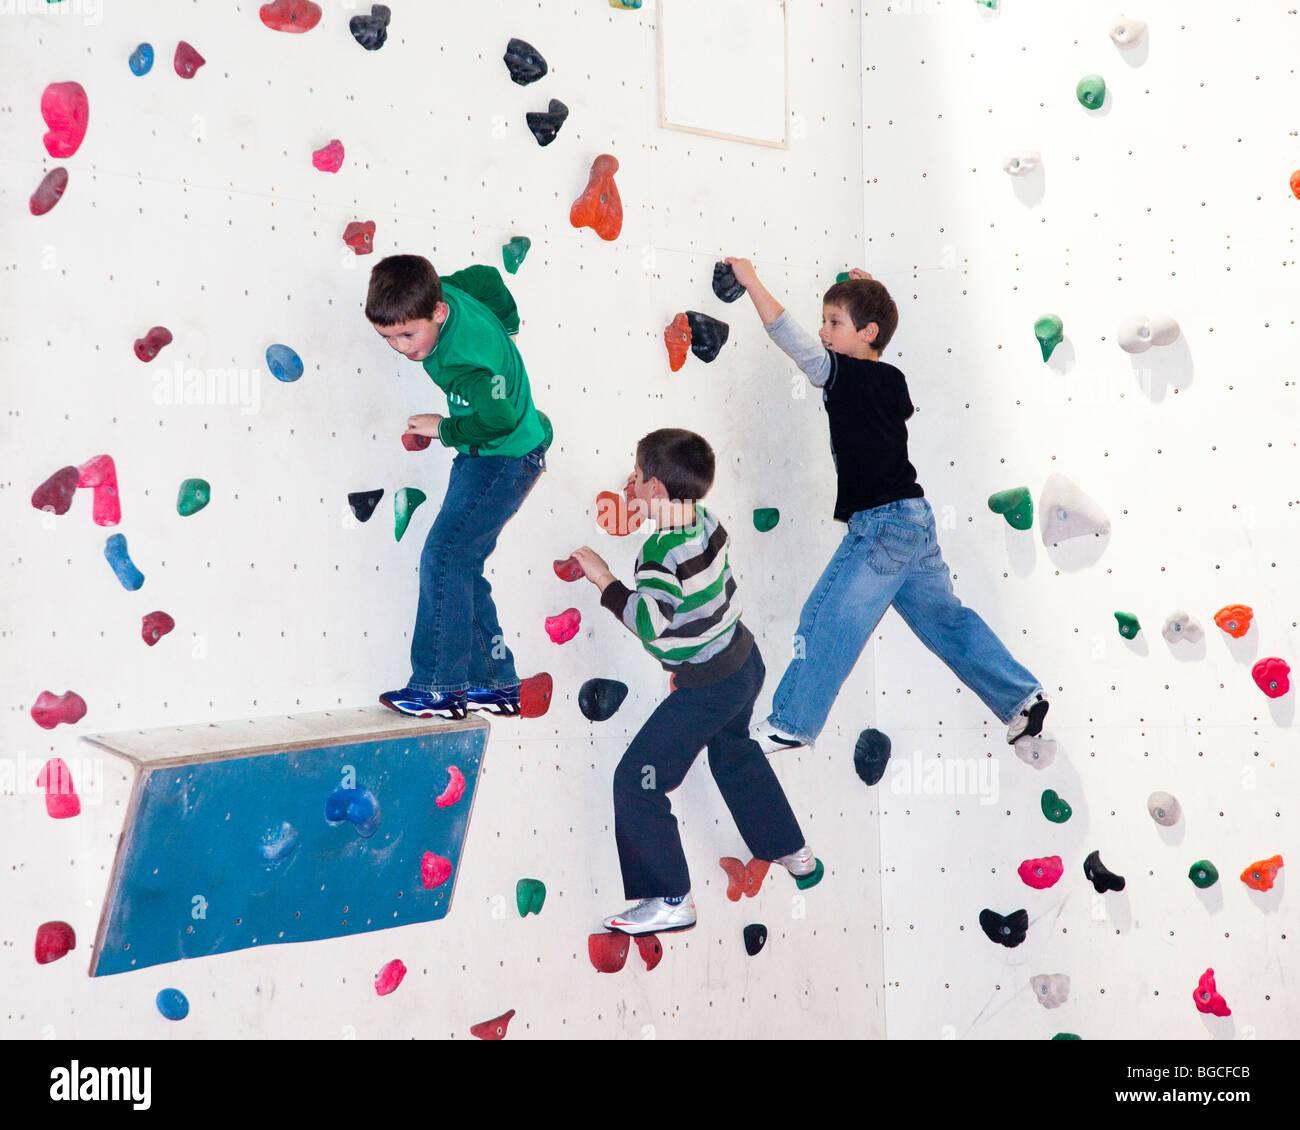 Children practice climbing on indoor climbing wall Cardiff Wales UK - Stock Image